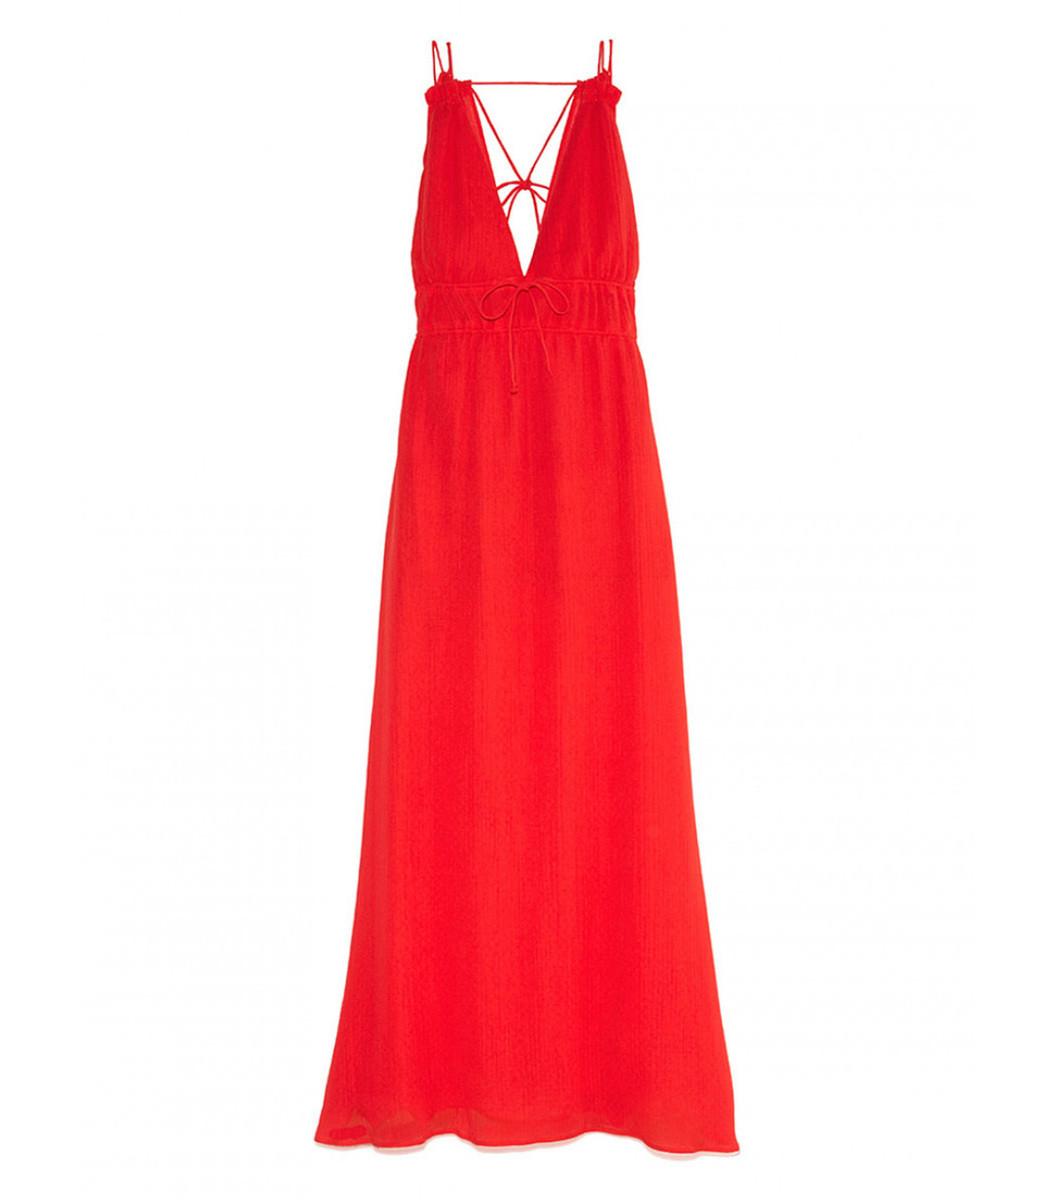 Ines De La Fressange Palavas Dress